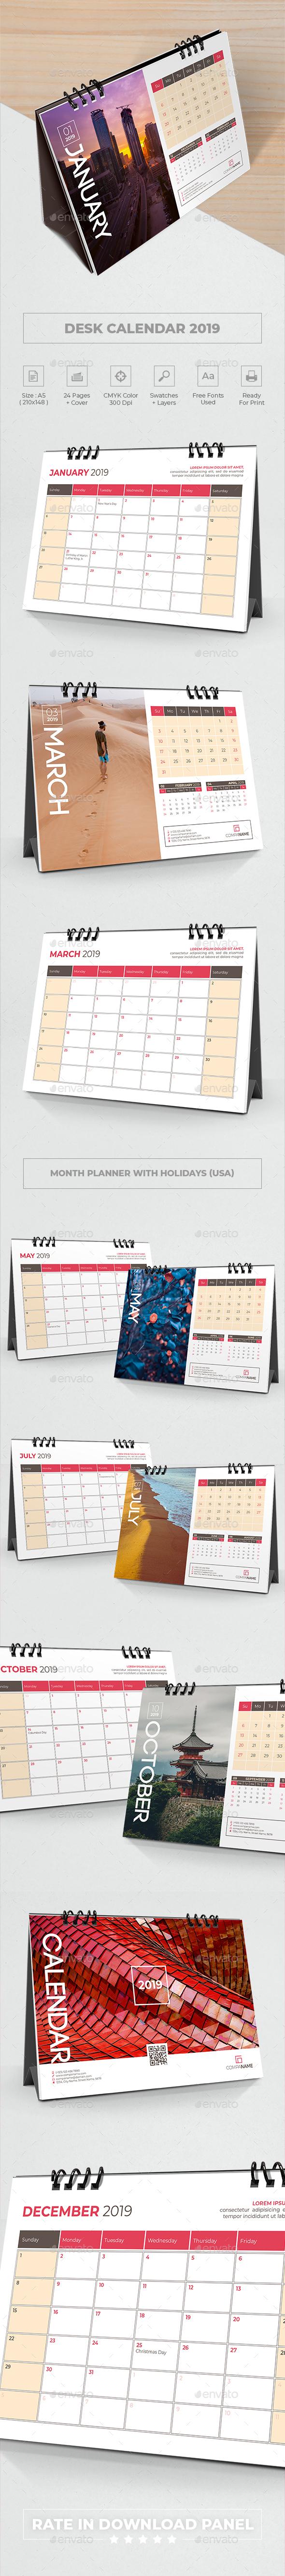 Desk Calendar Planner 2019 - Calendars Stationery